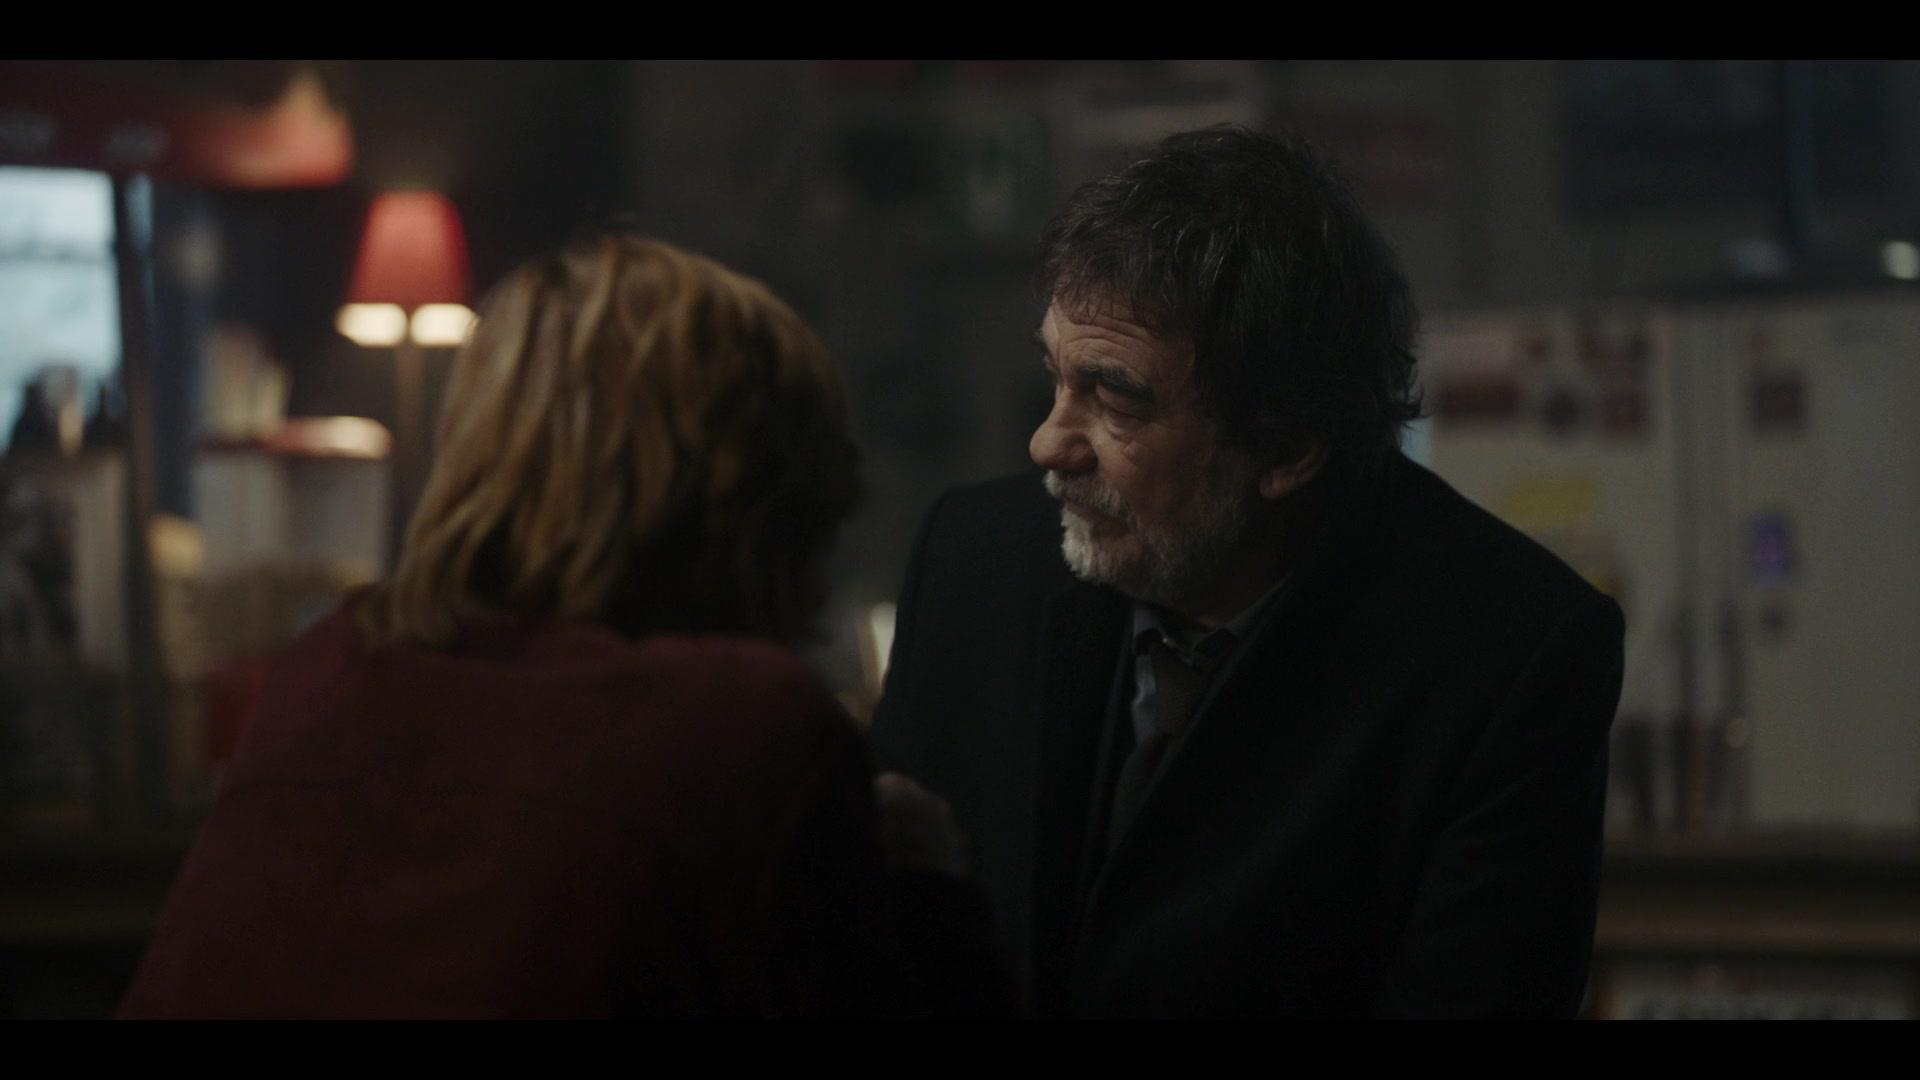 The Crimson Rivers S01